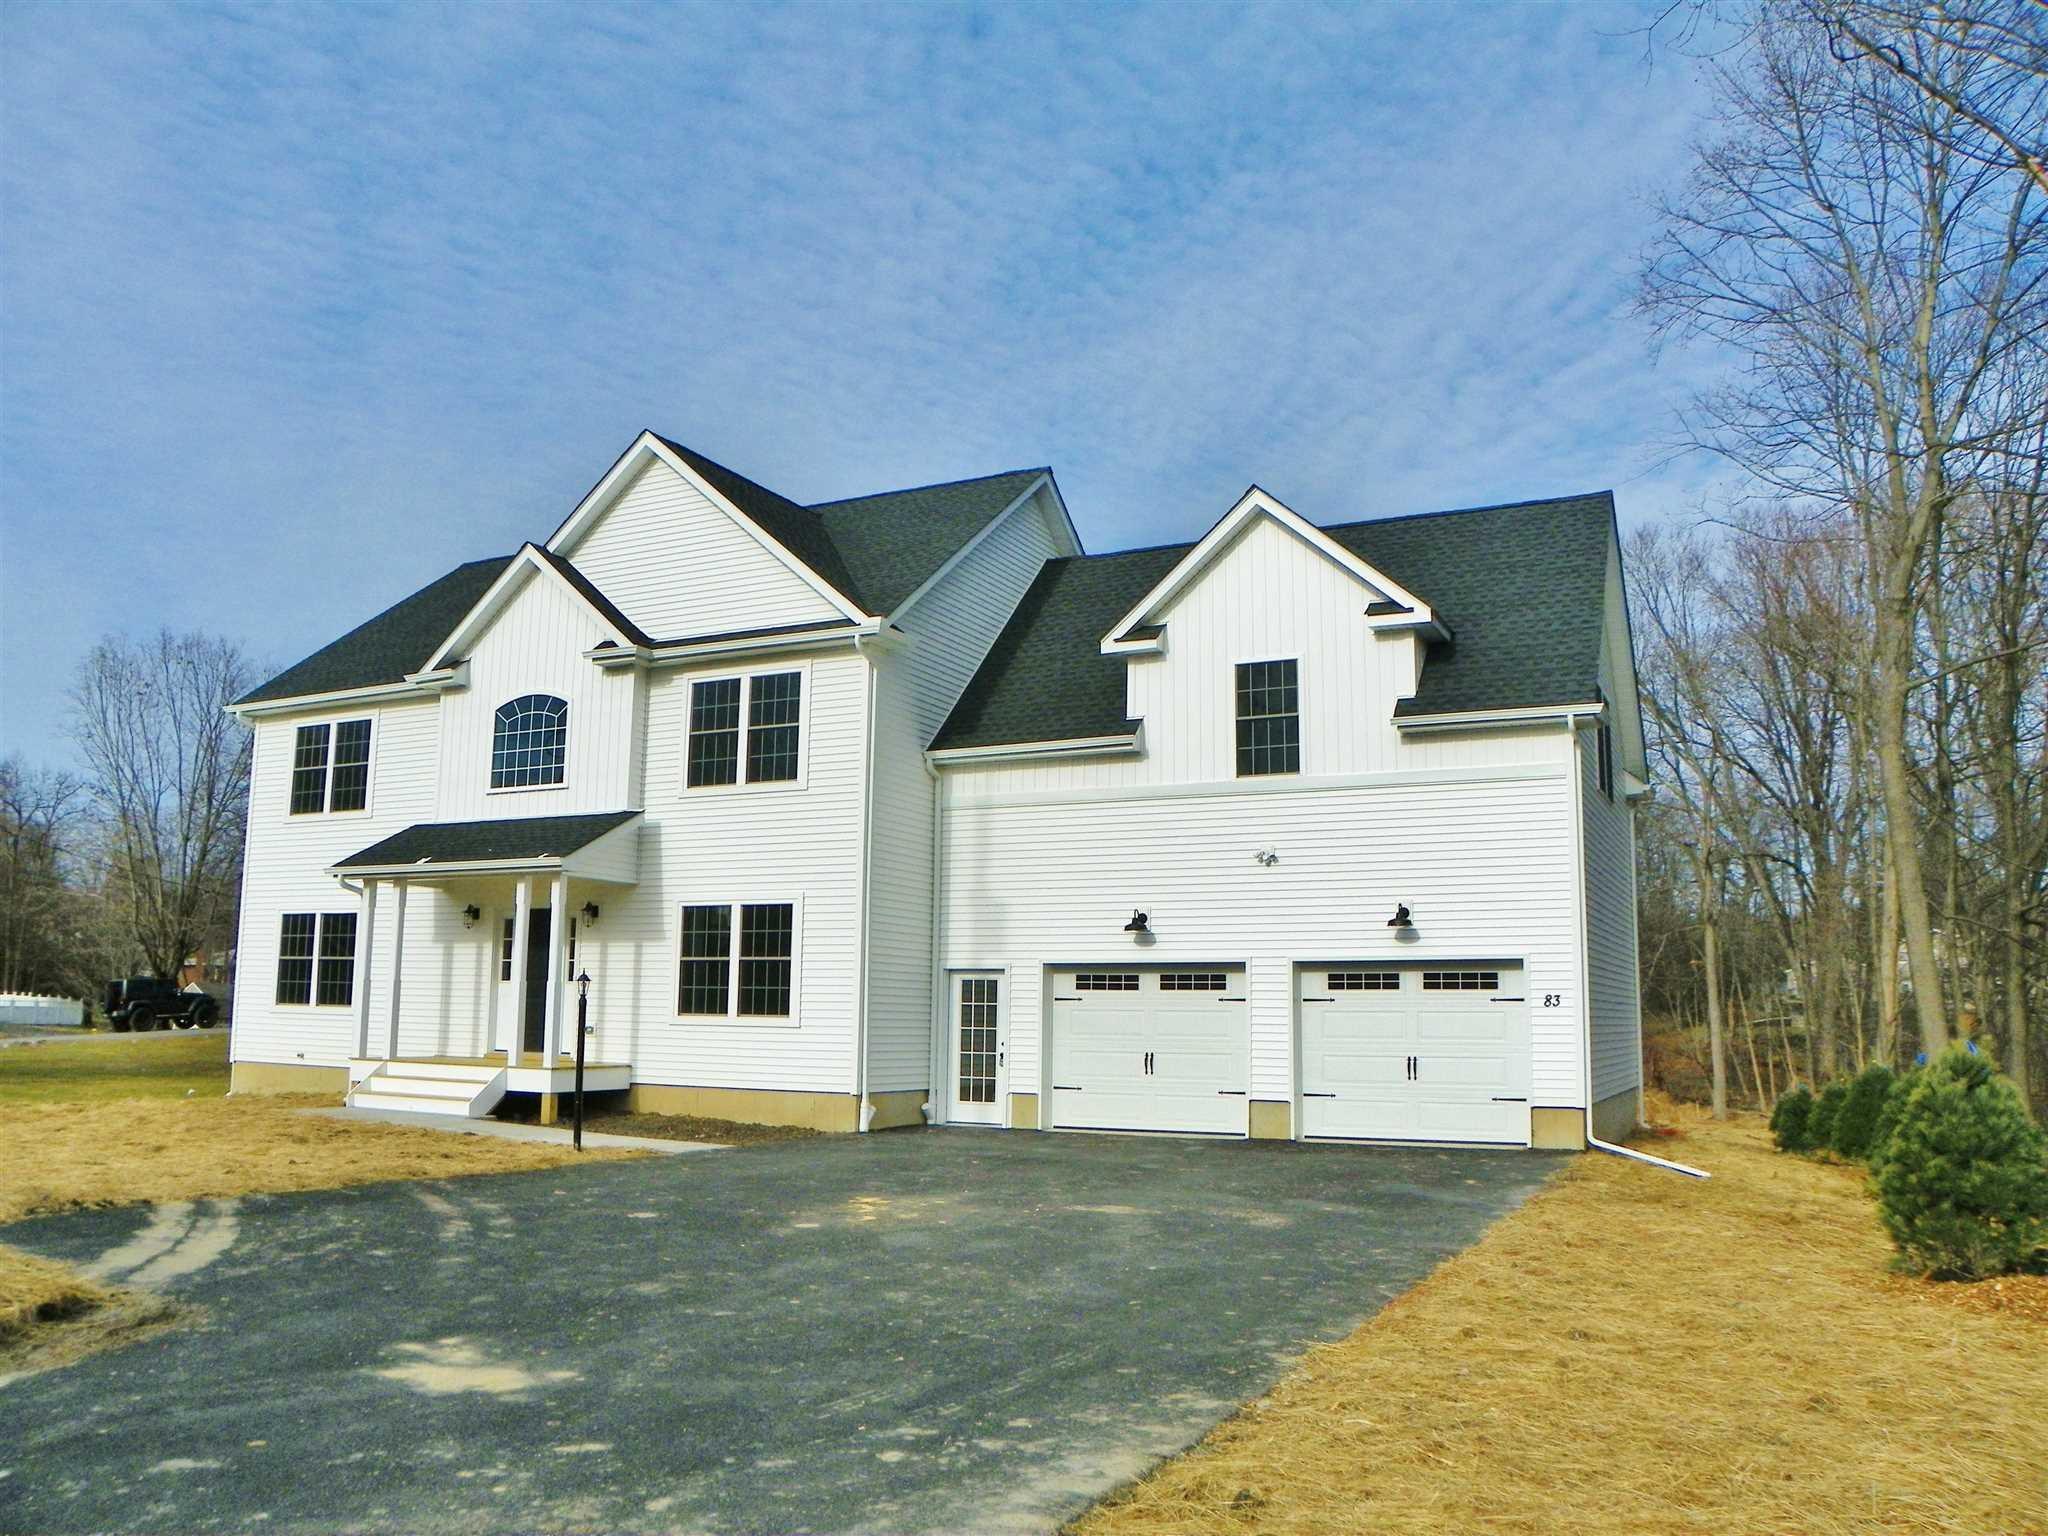 Single Family Home for Sale at 83 DELAVERGNE Avenue 83 DELAVERGNE Avenue Poughkeepsie, New York 12603 United States